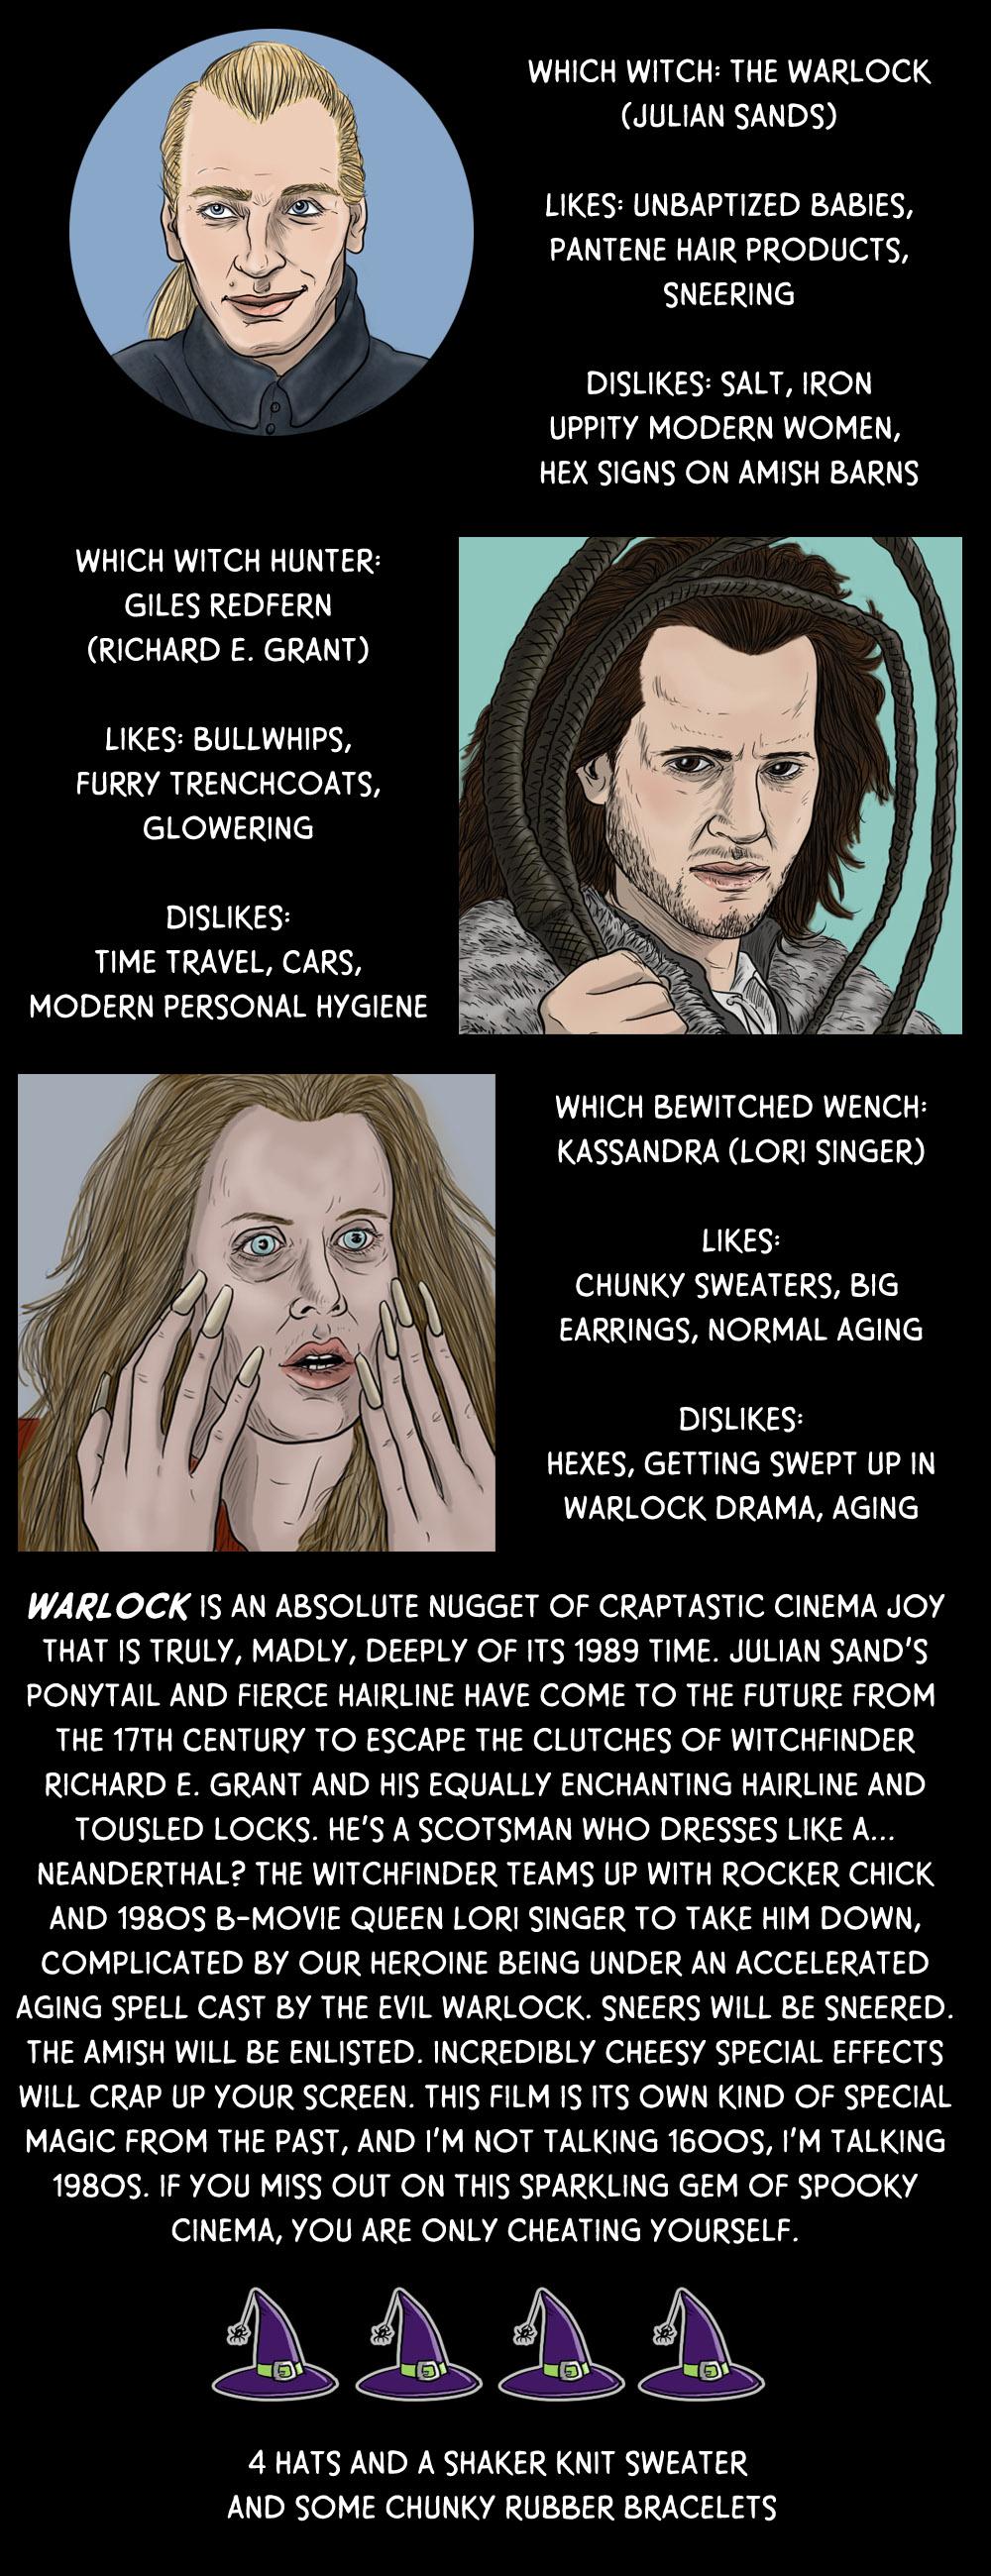 October 4: Warlock